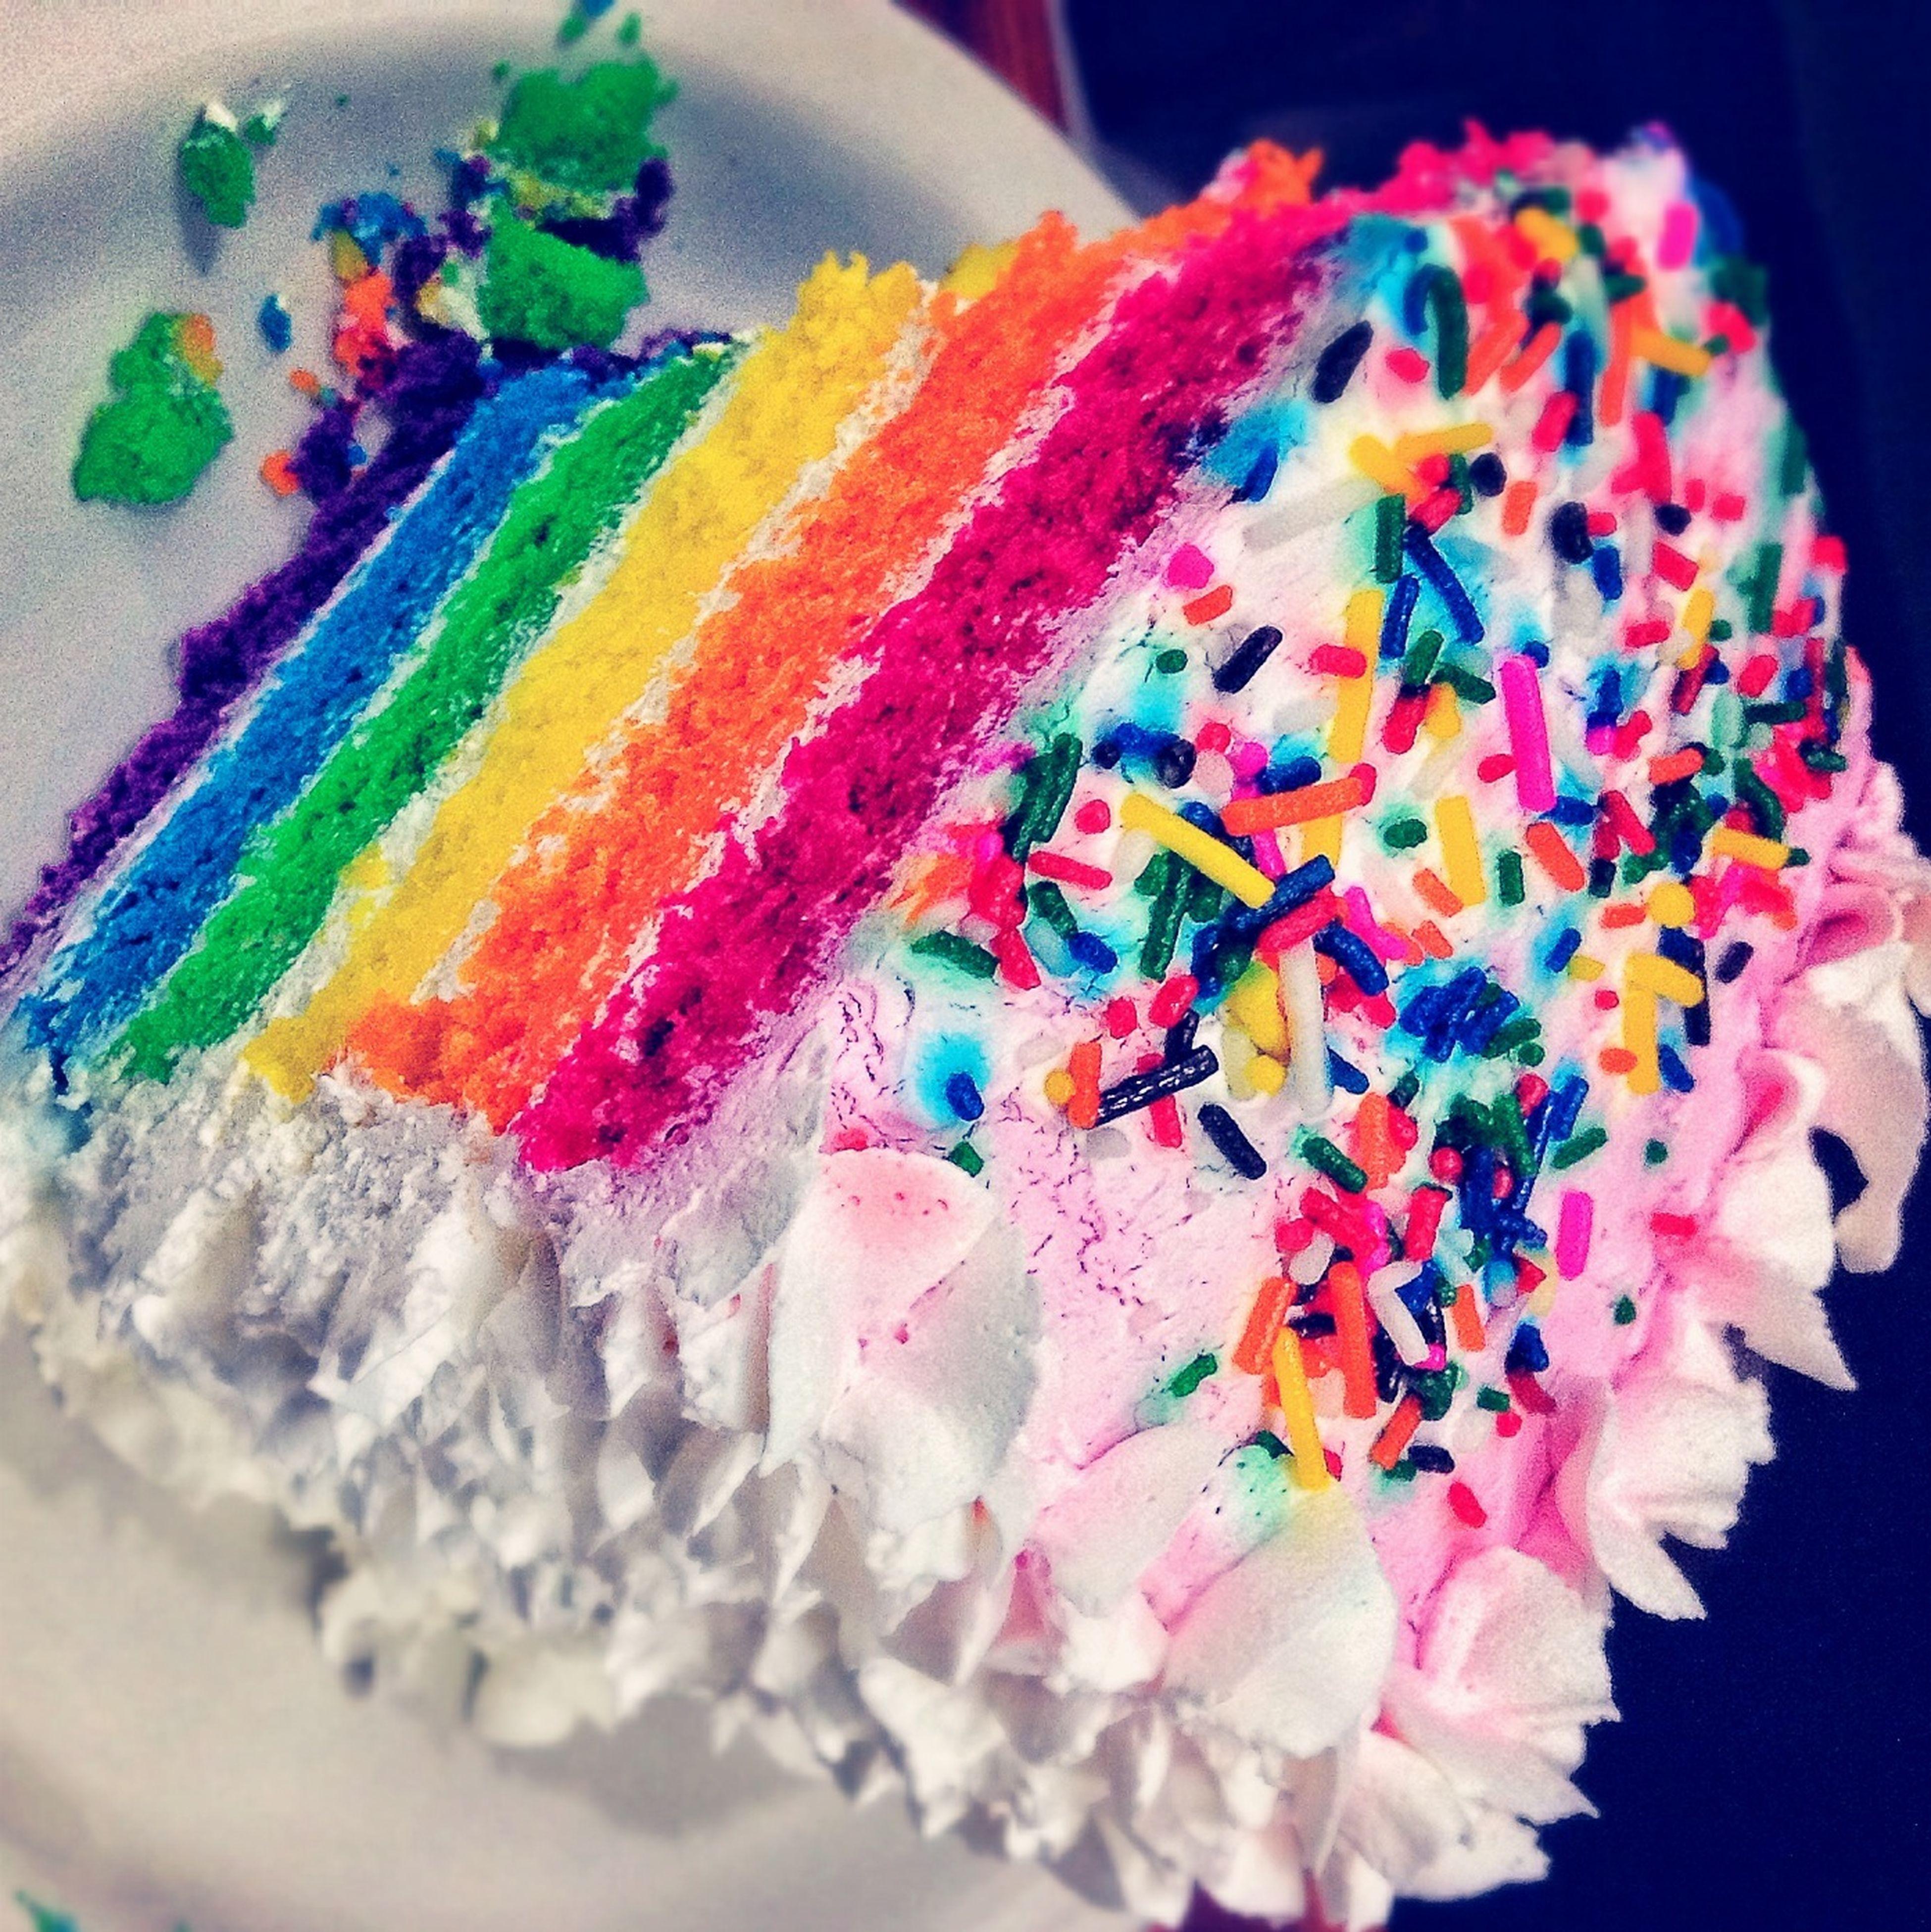 Enjoying Life with a slice of Rainbow Cake - Food Foodporn